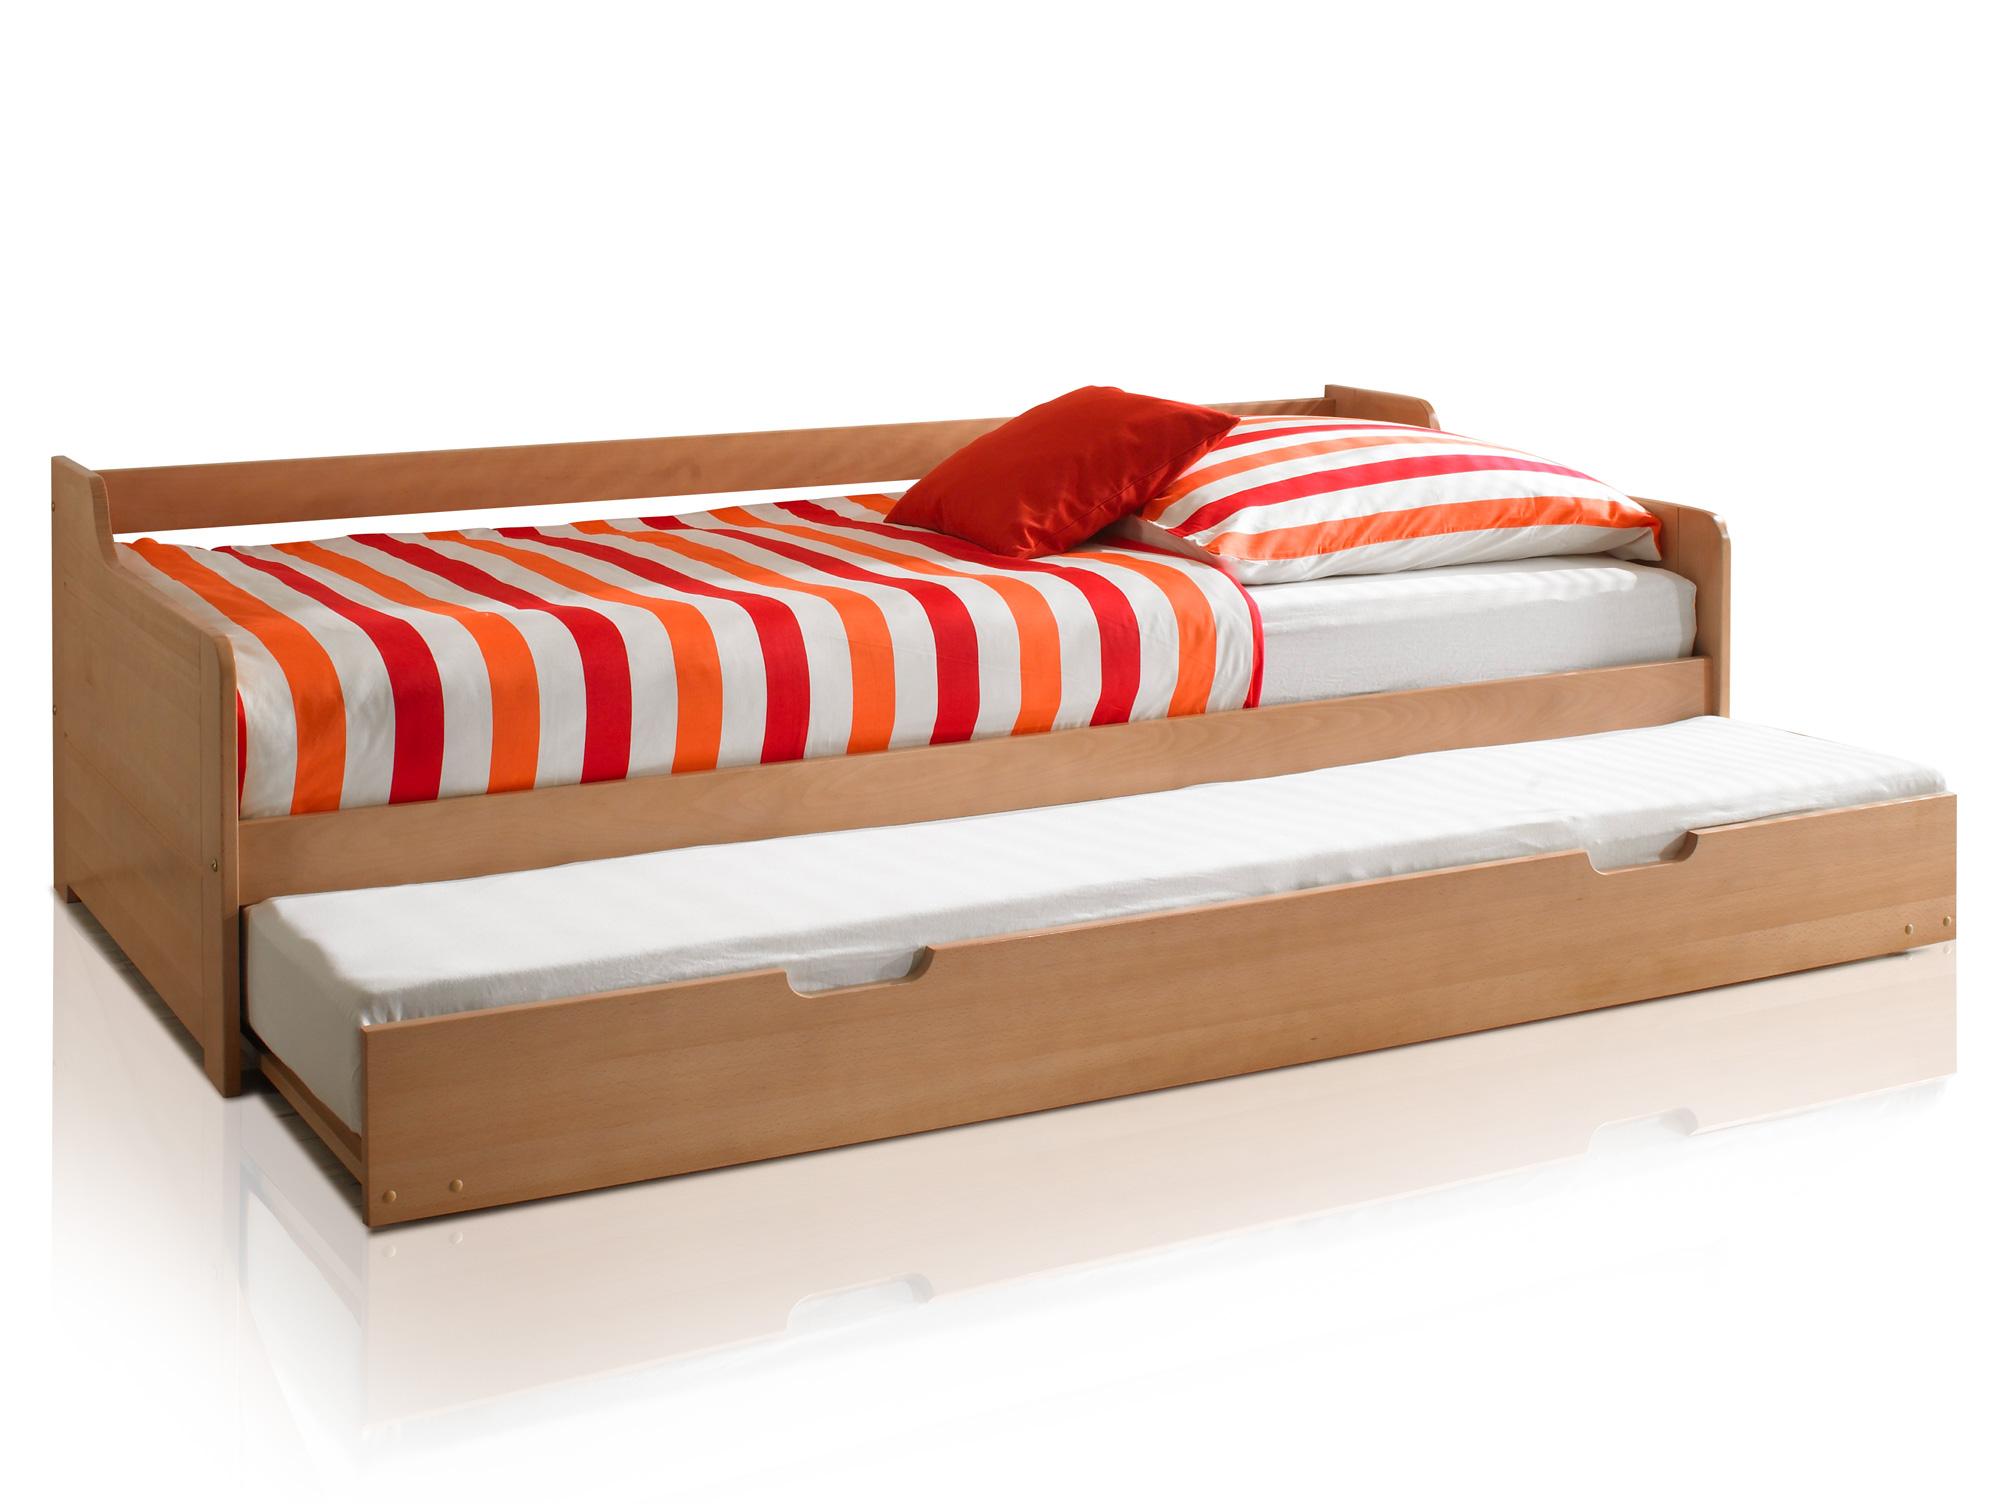 bobby tandemliege funktionsbett buche natur massiv. Black Bedroom Furniture Sets. Home Design Ideas